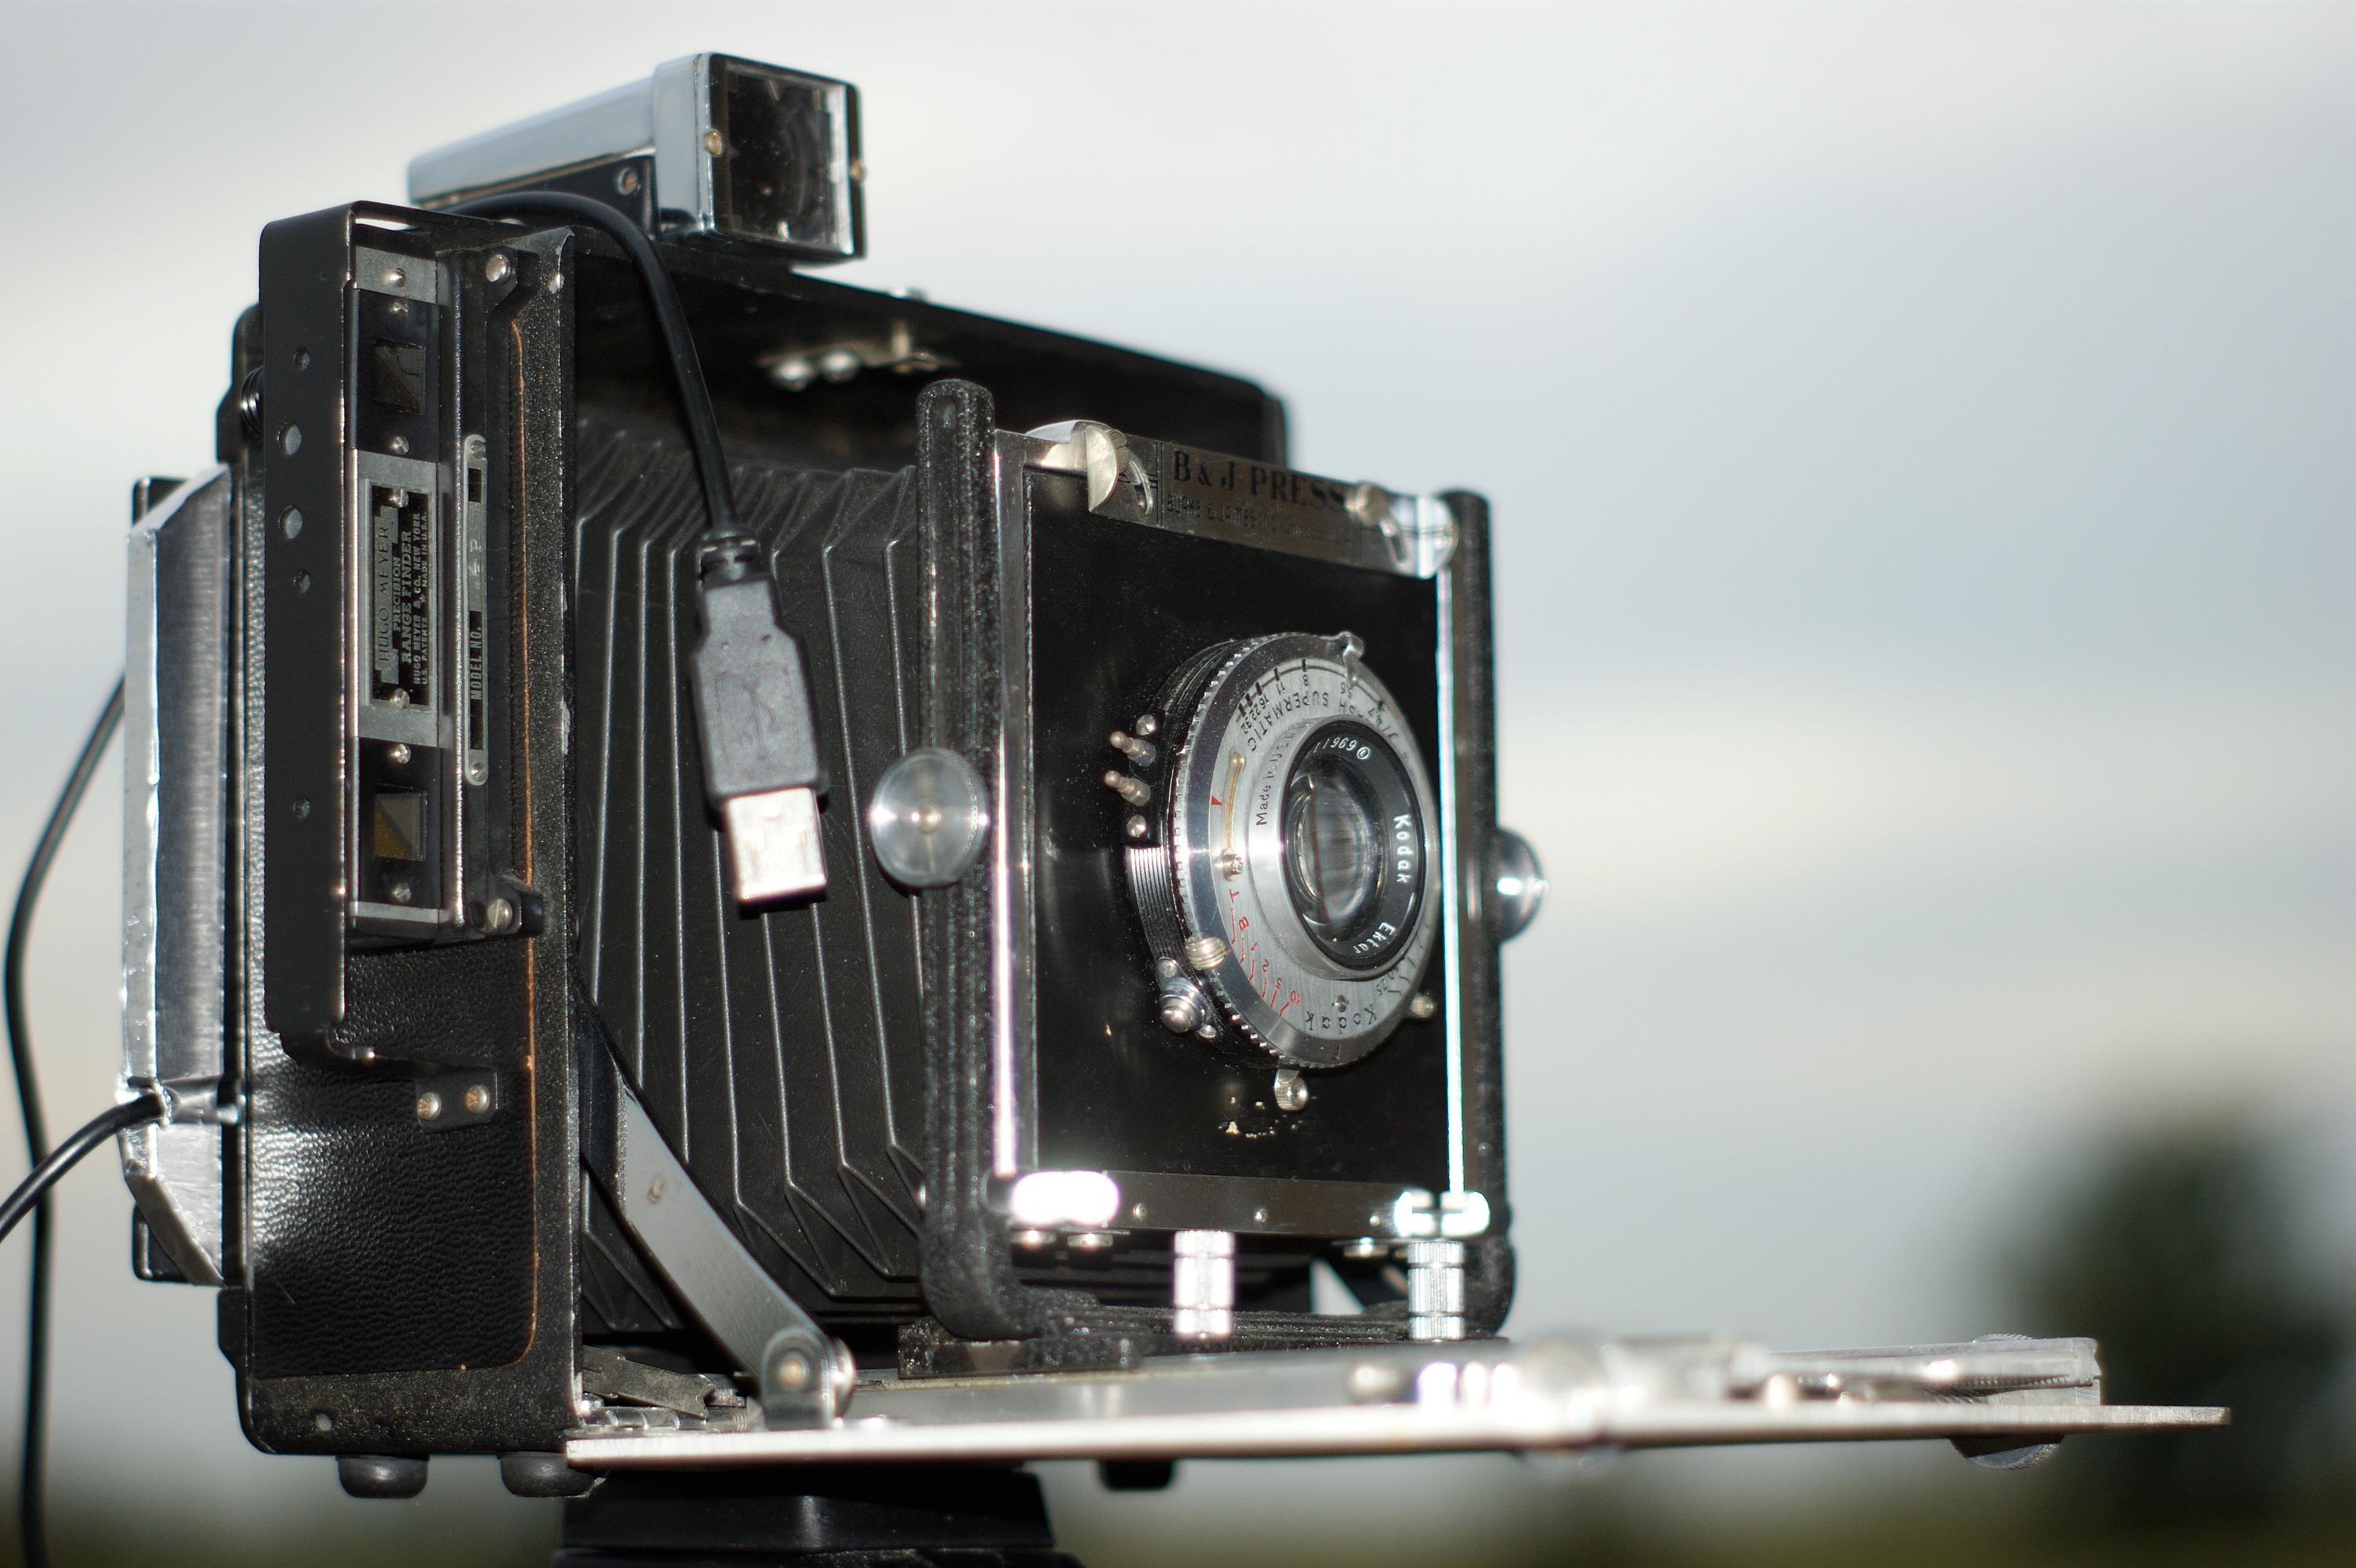 The Aggregate: Big Old Camera, Tiny New Sensor